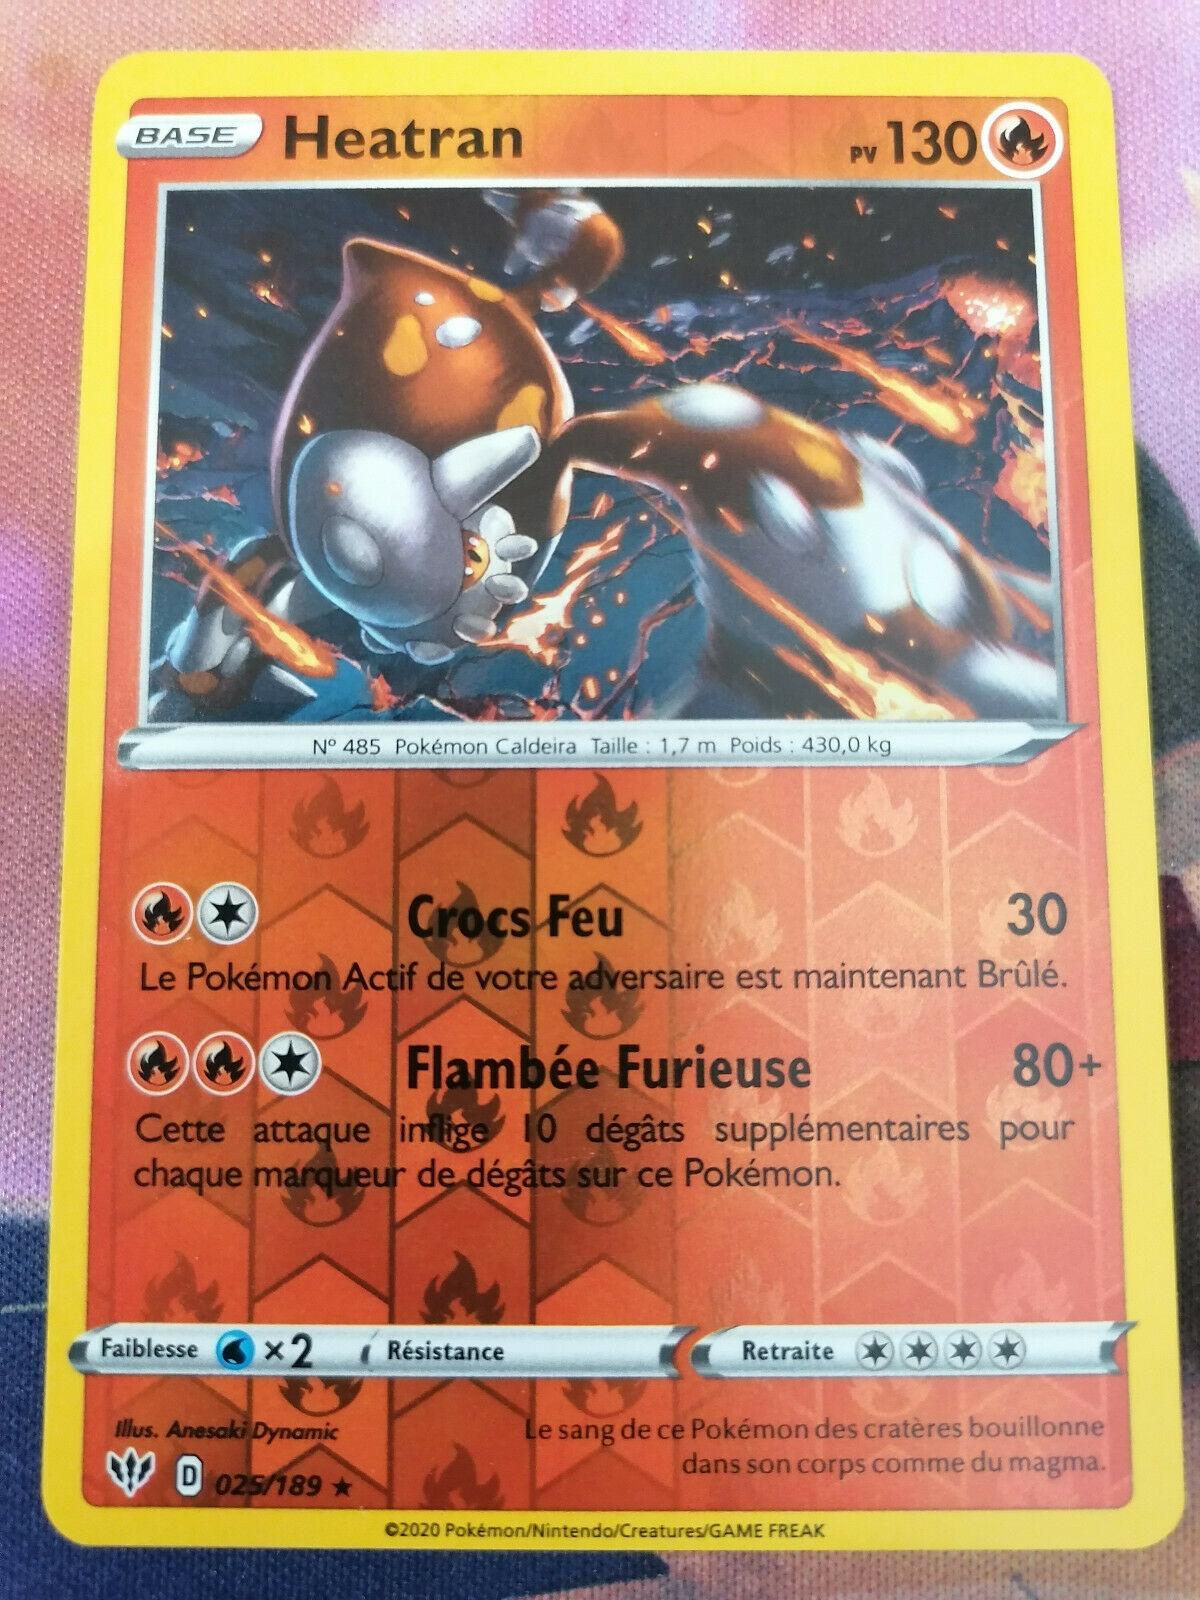 Details about  /Pokemon Heatran - SWSH Darkness Ablaze Holo Rare Reverse Foil 025//189